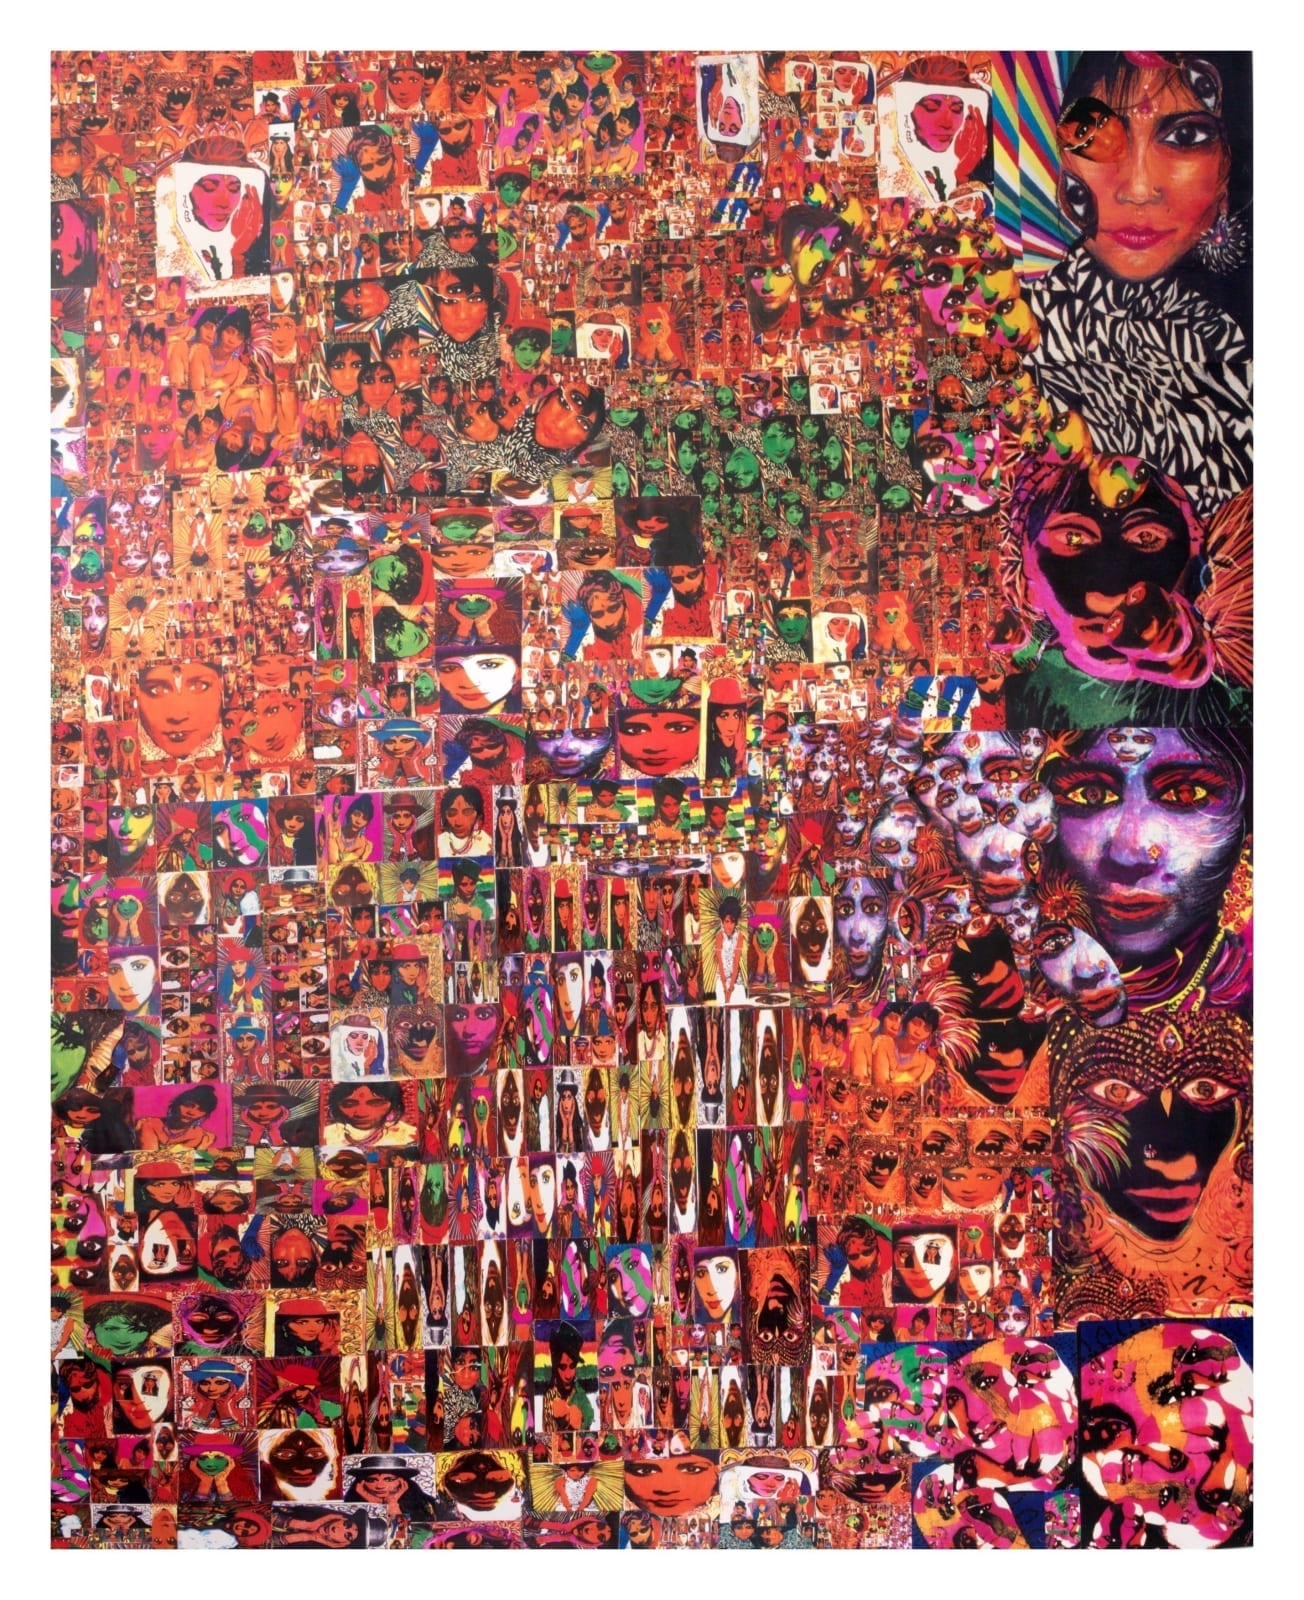 Chila Kumari Singh Burman, Self Portrait High Velocity, 2017